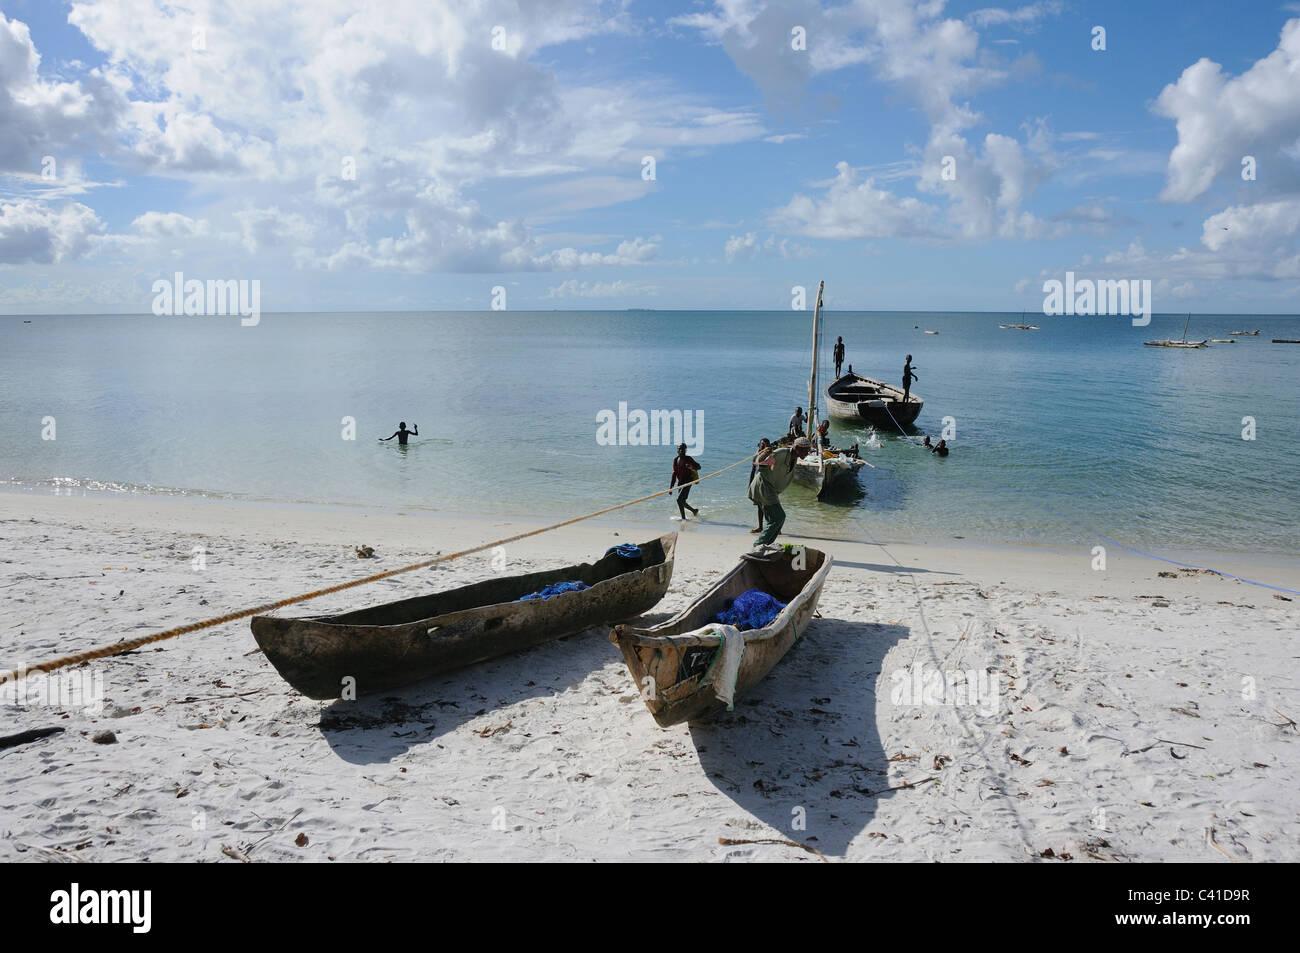 Fishermen landing their dugout canoes at 'Ras Mbisi' on the coast of Mafia Island, Tanzania - Stock Image